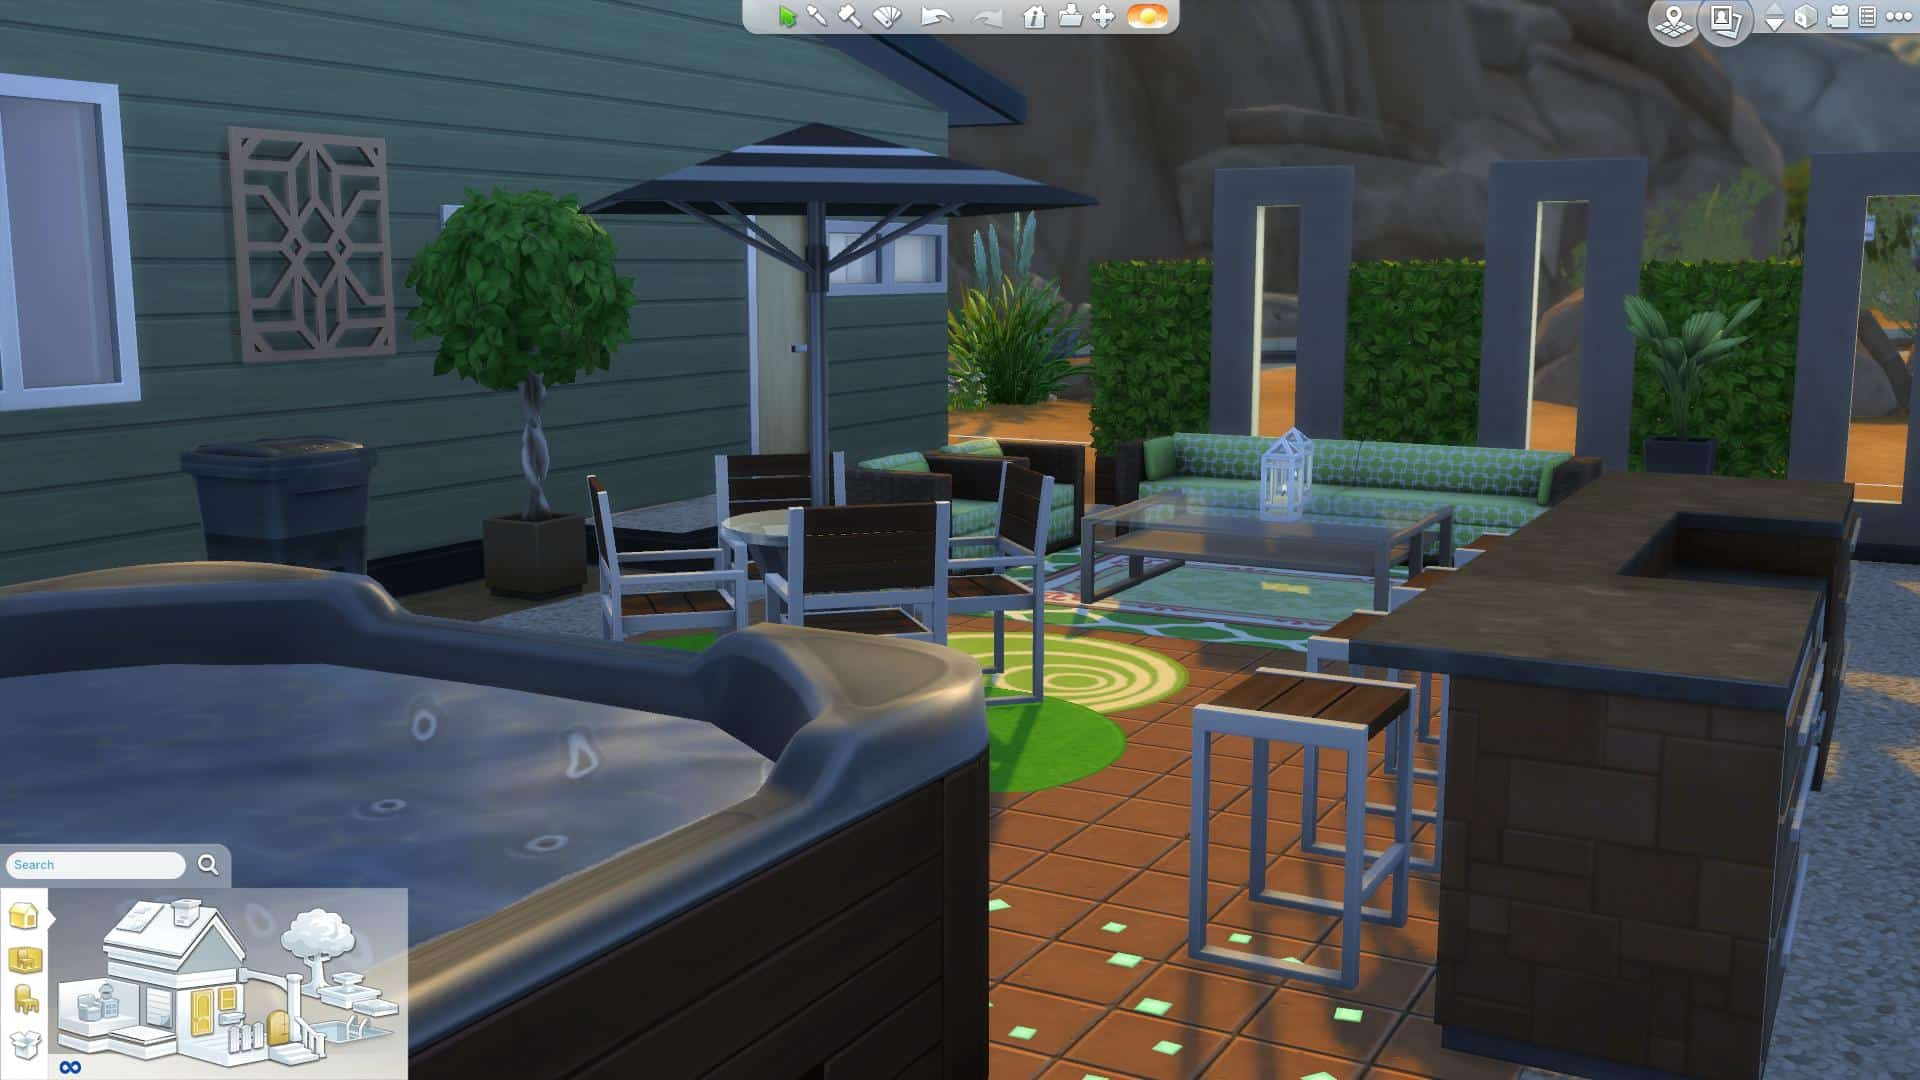 The Sims 4 Design Guide: Patio Decor - photo#23